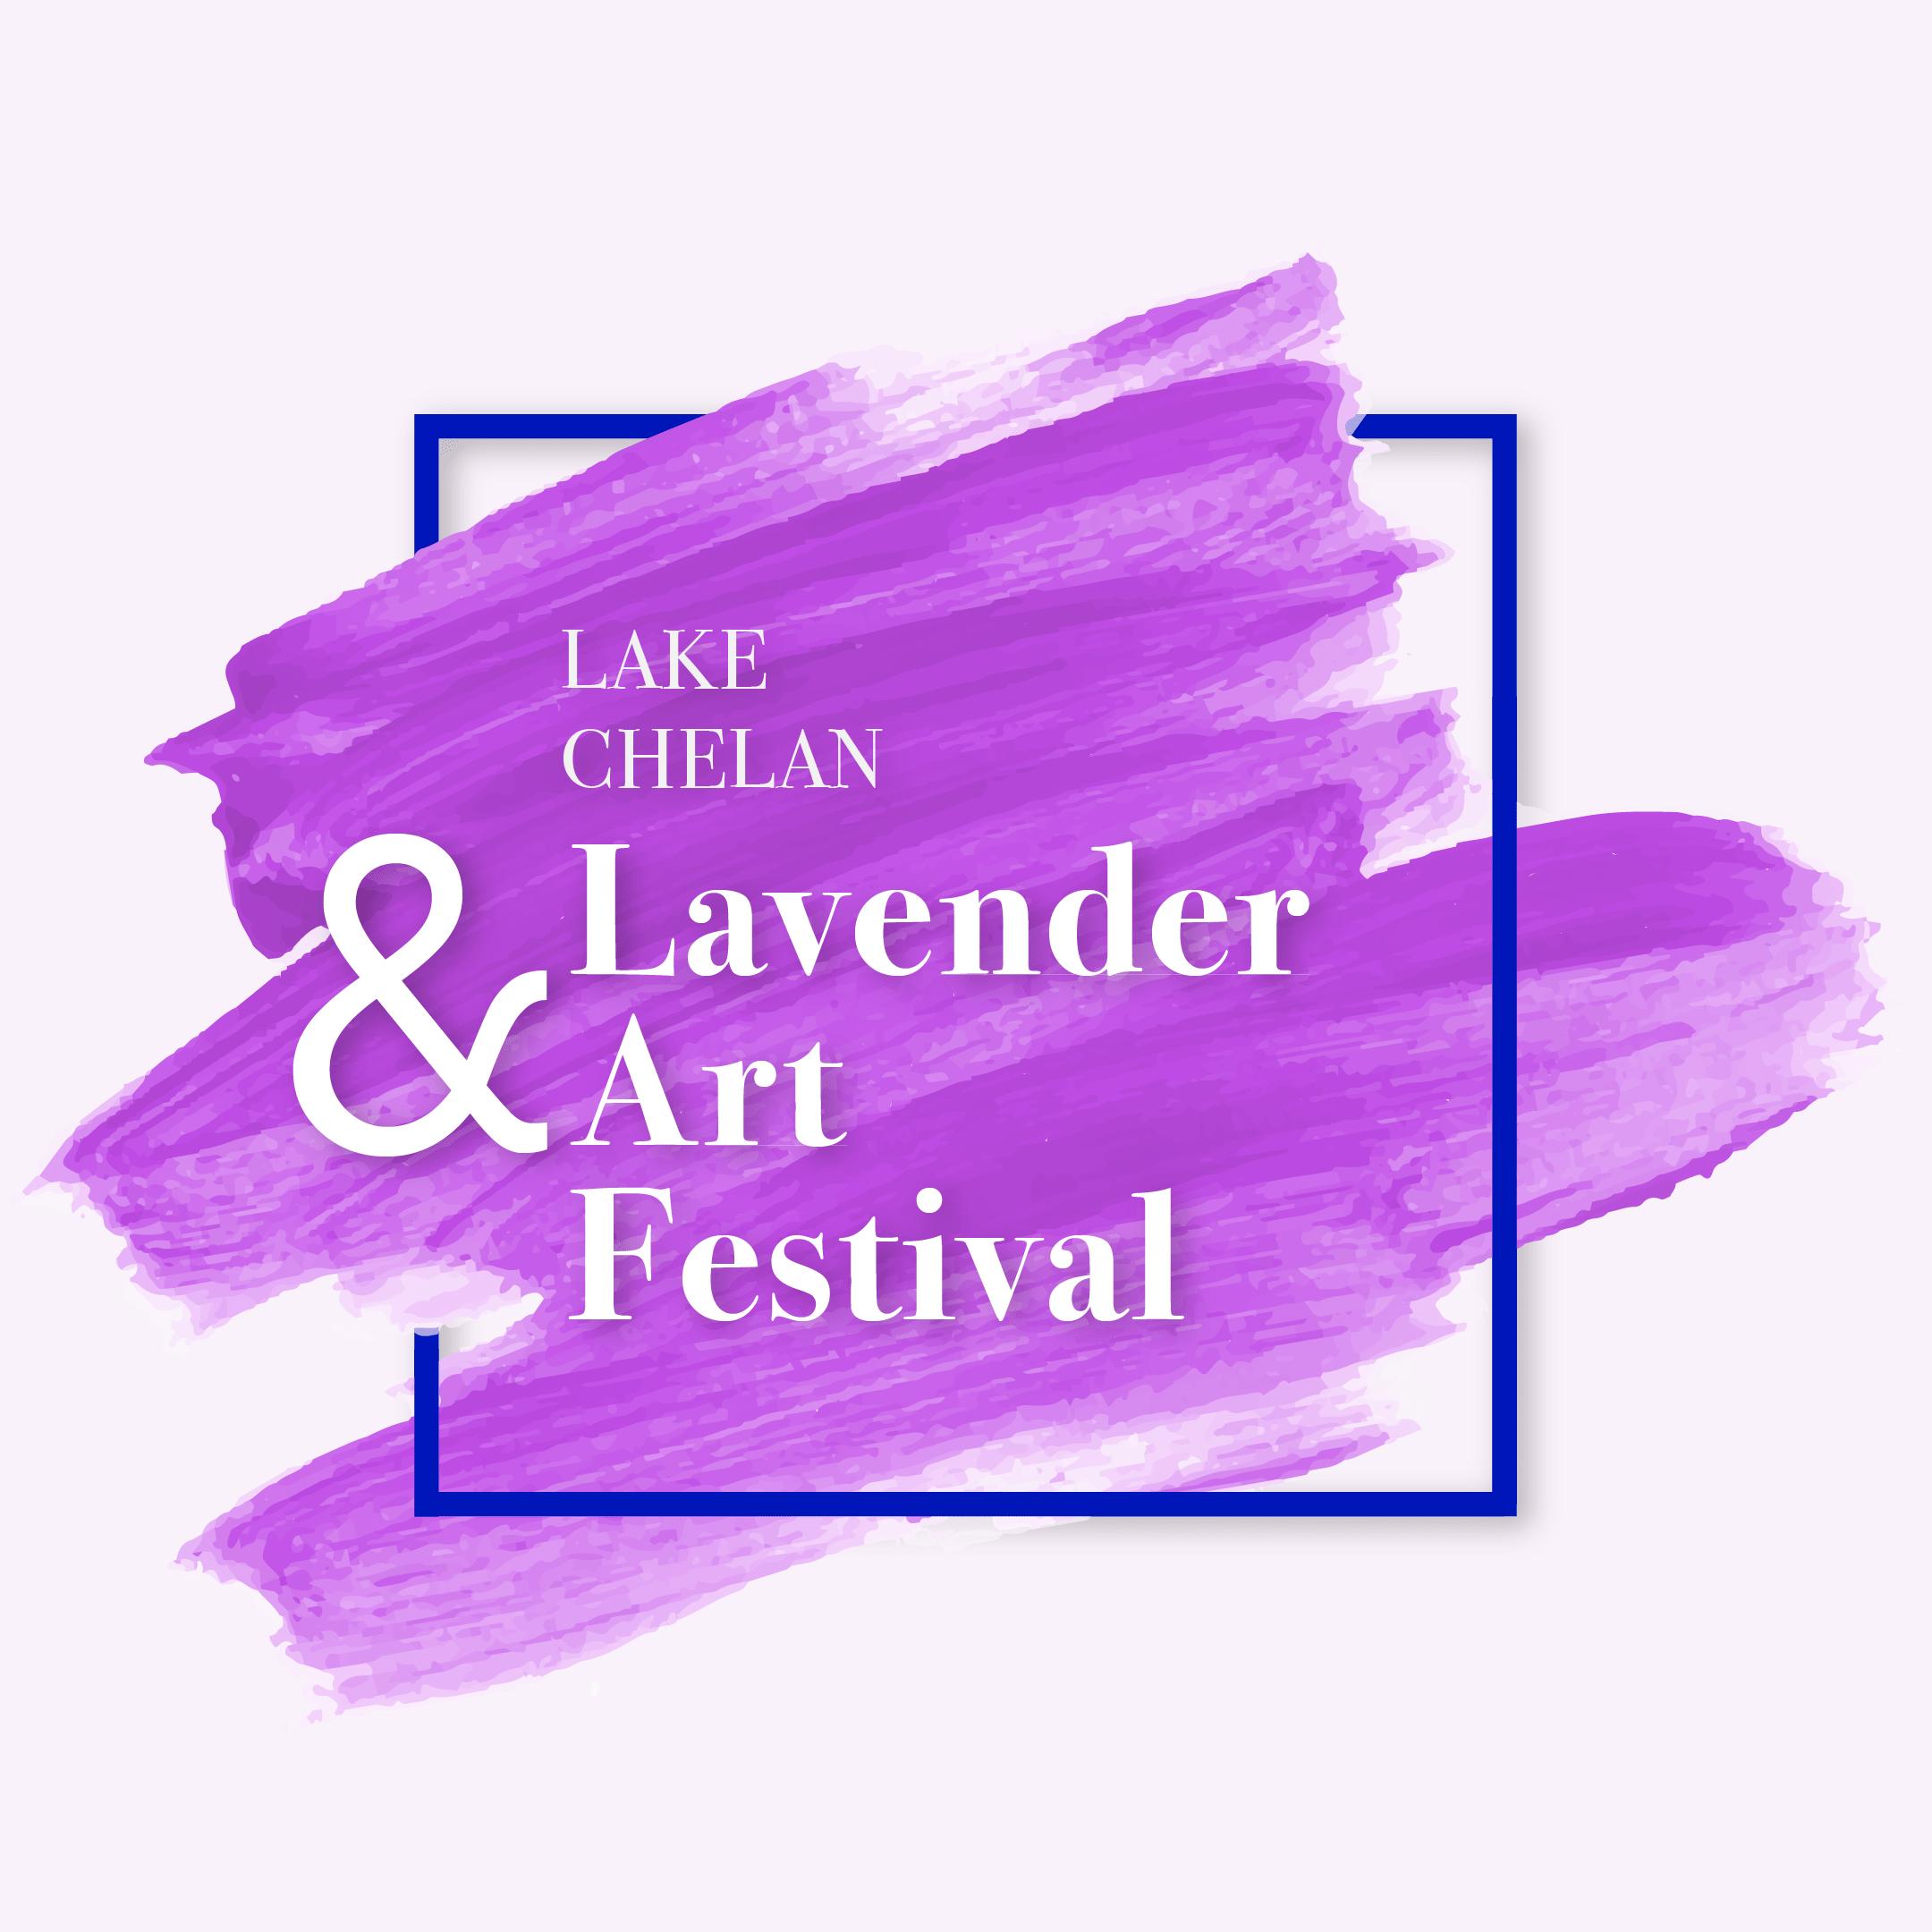 Lake Chelan Lavender & Art Fest Logo - Window